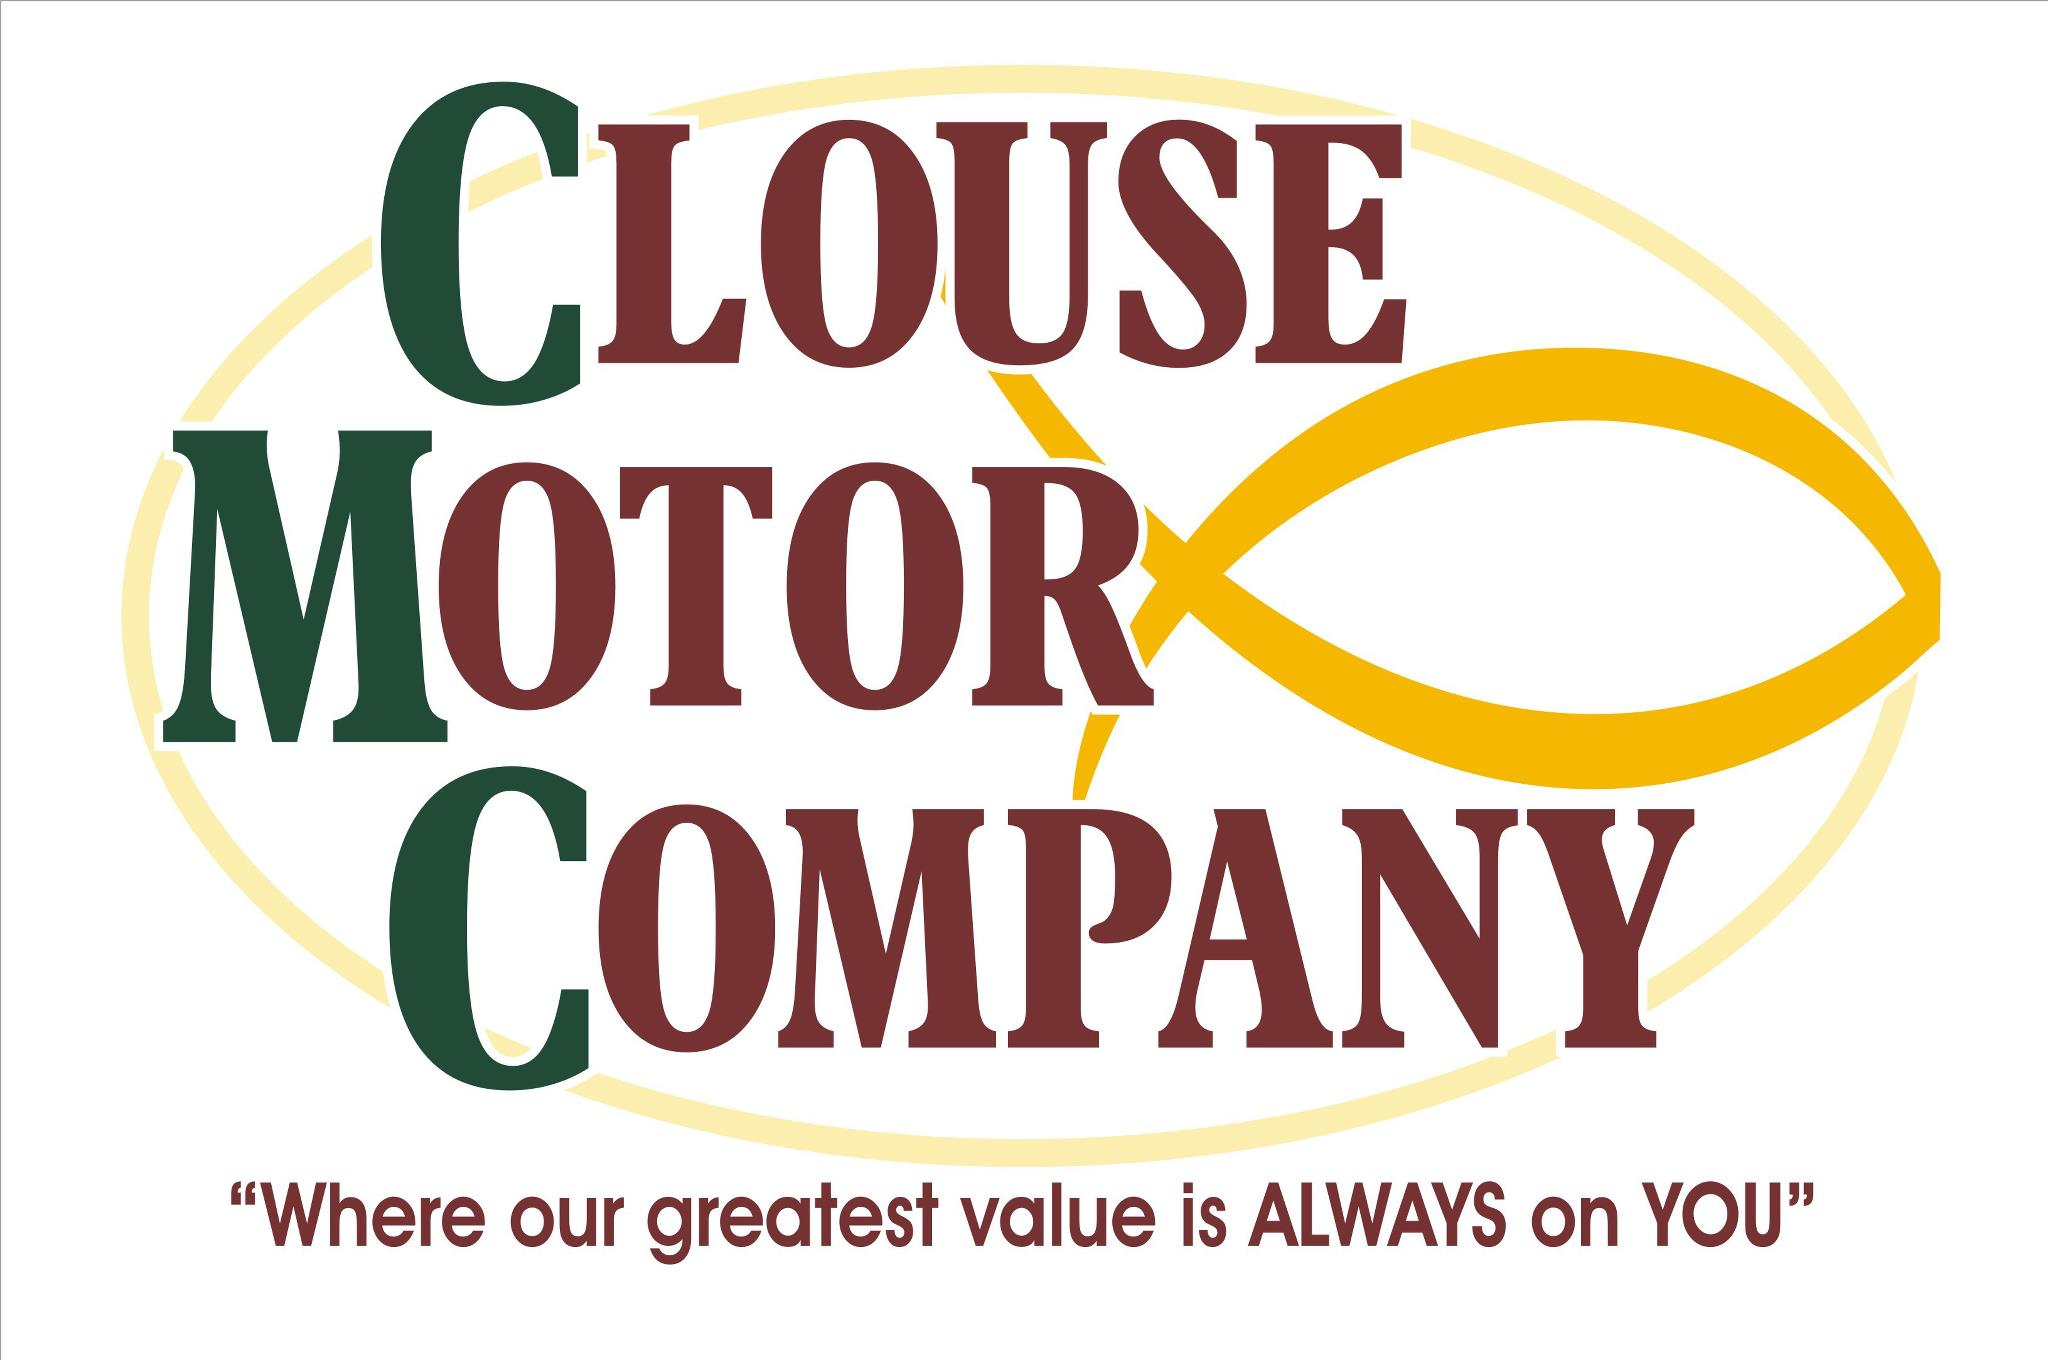 Clouse Motor Company, Inc